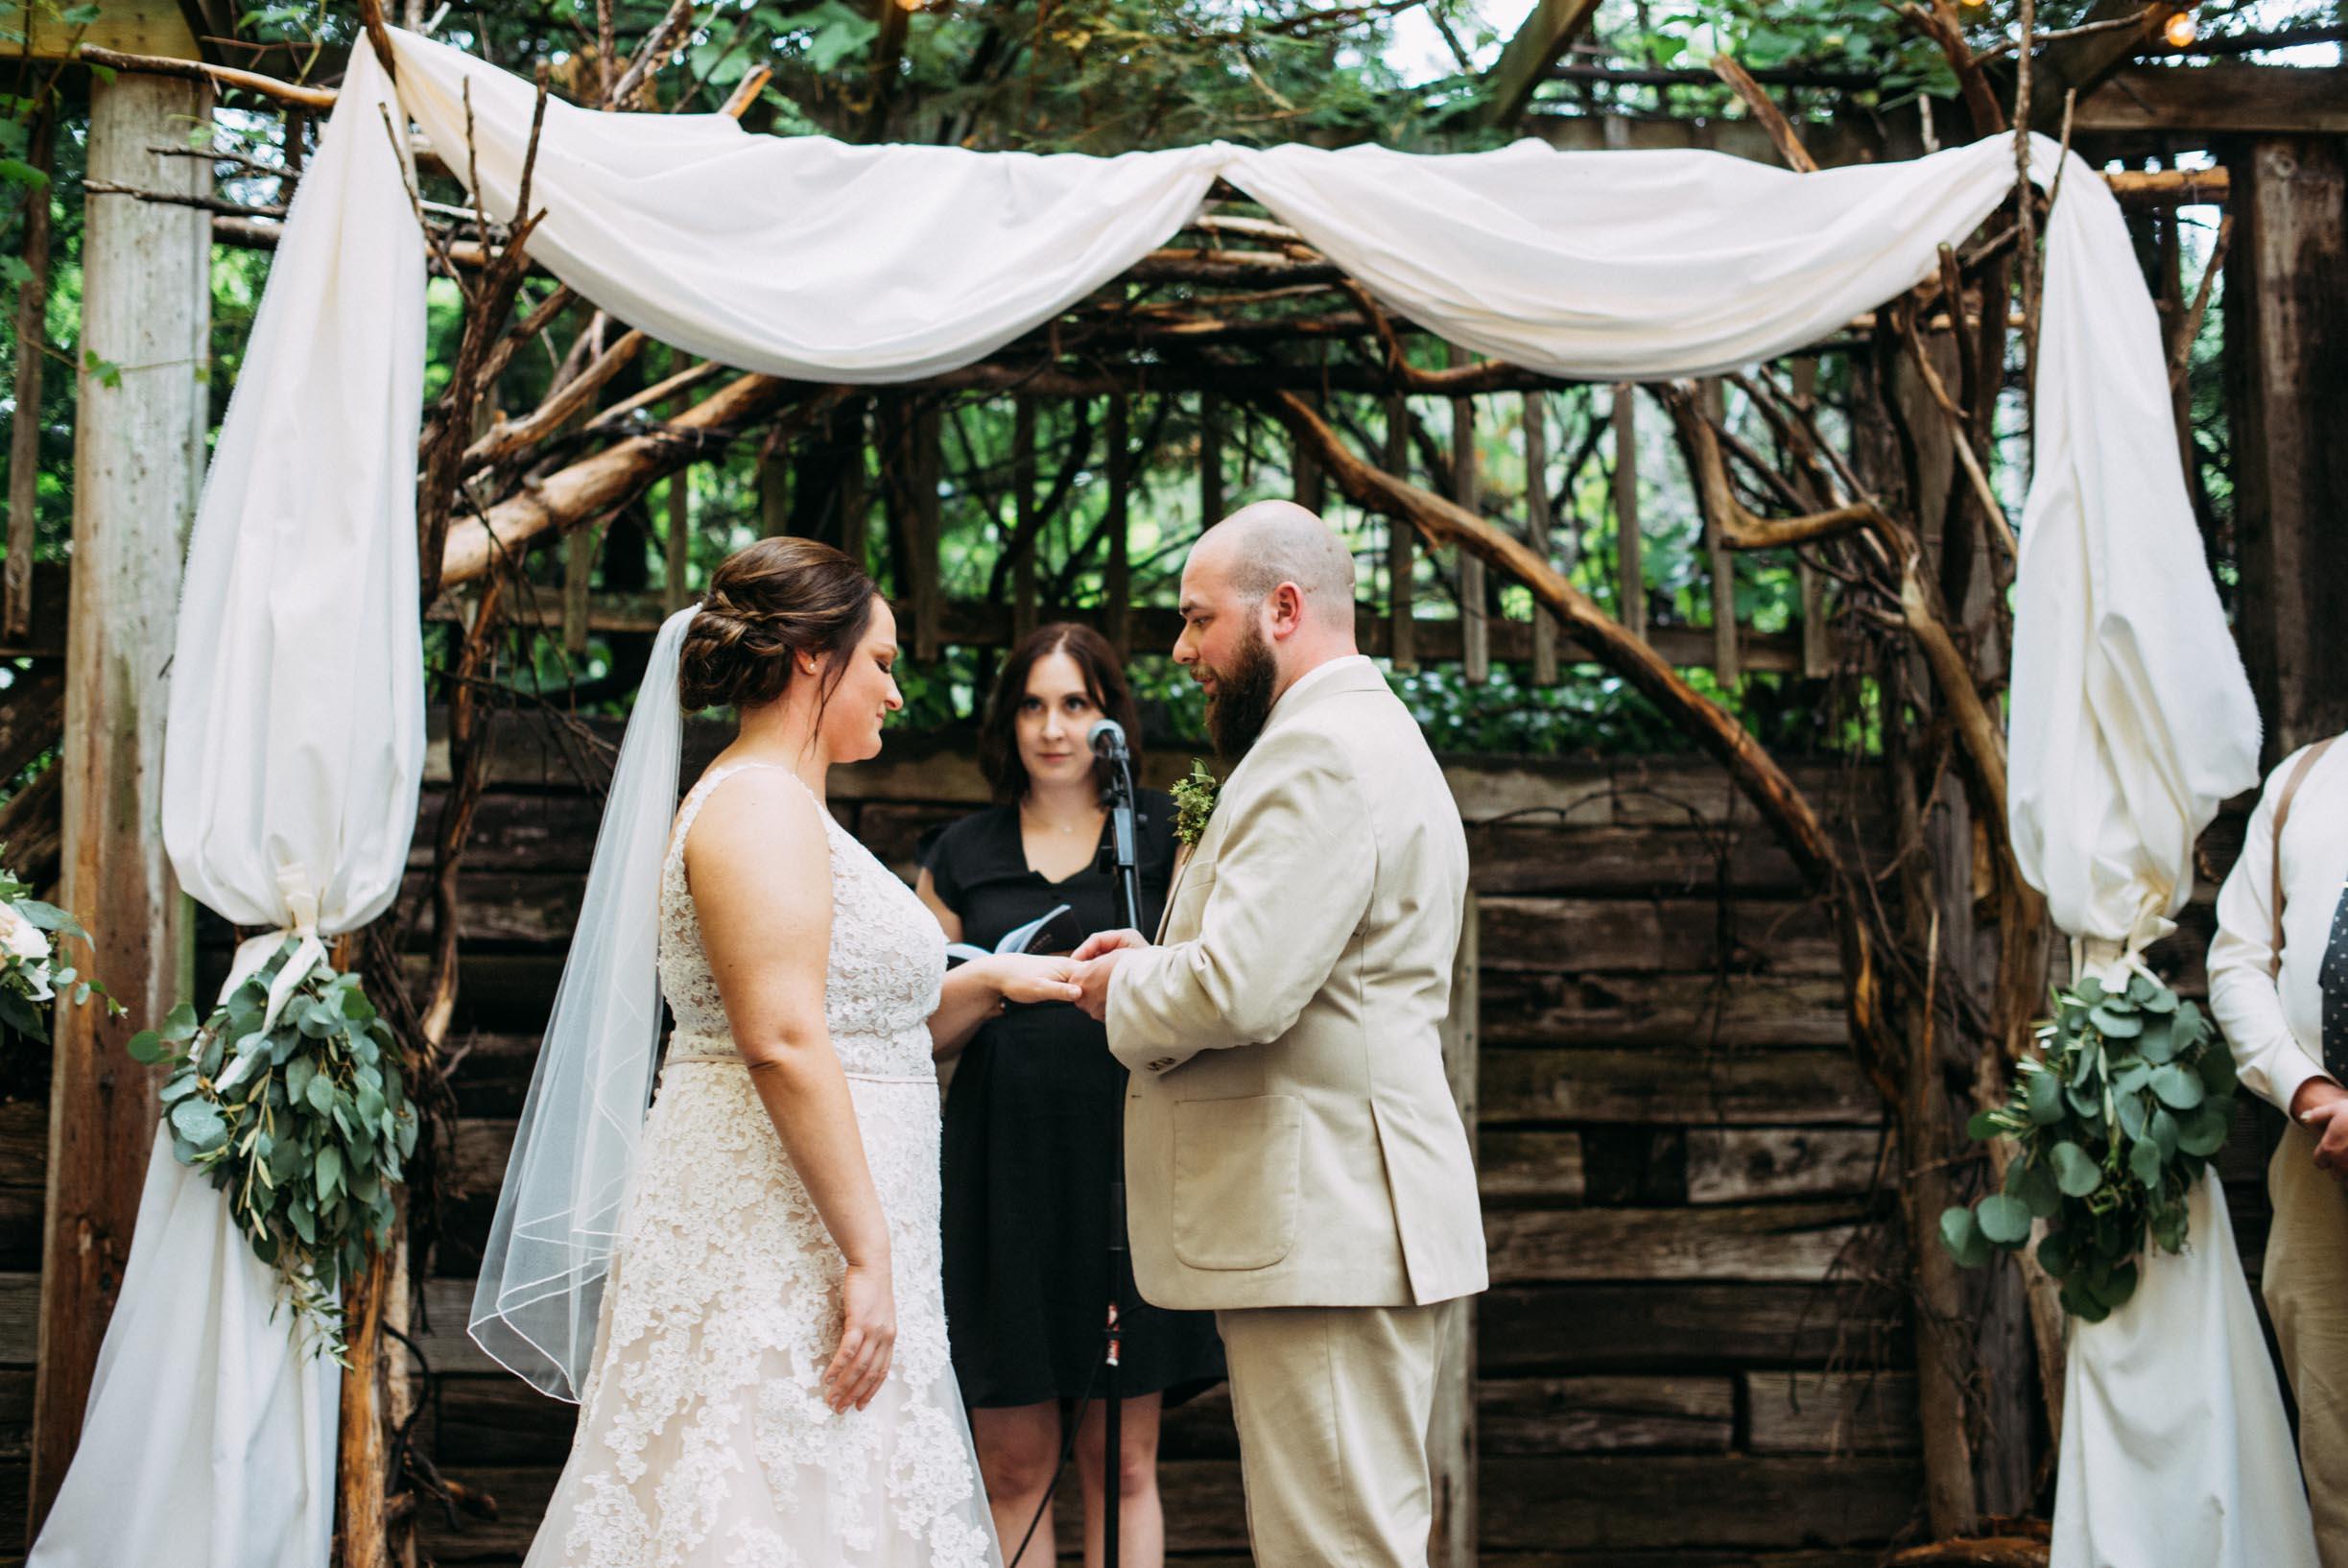 48-Jess_Jeremy_Minnesota_Wedding_Ceremony.jpg